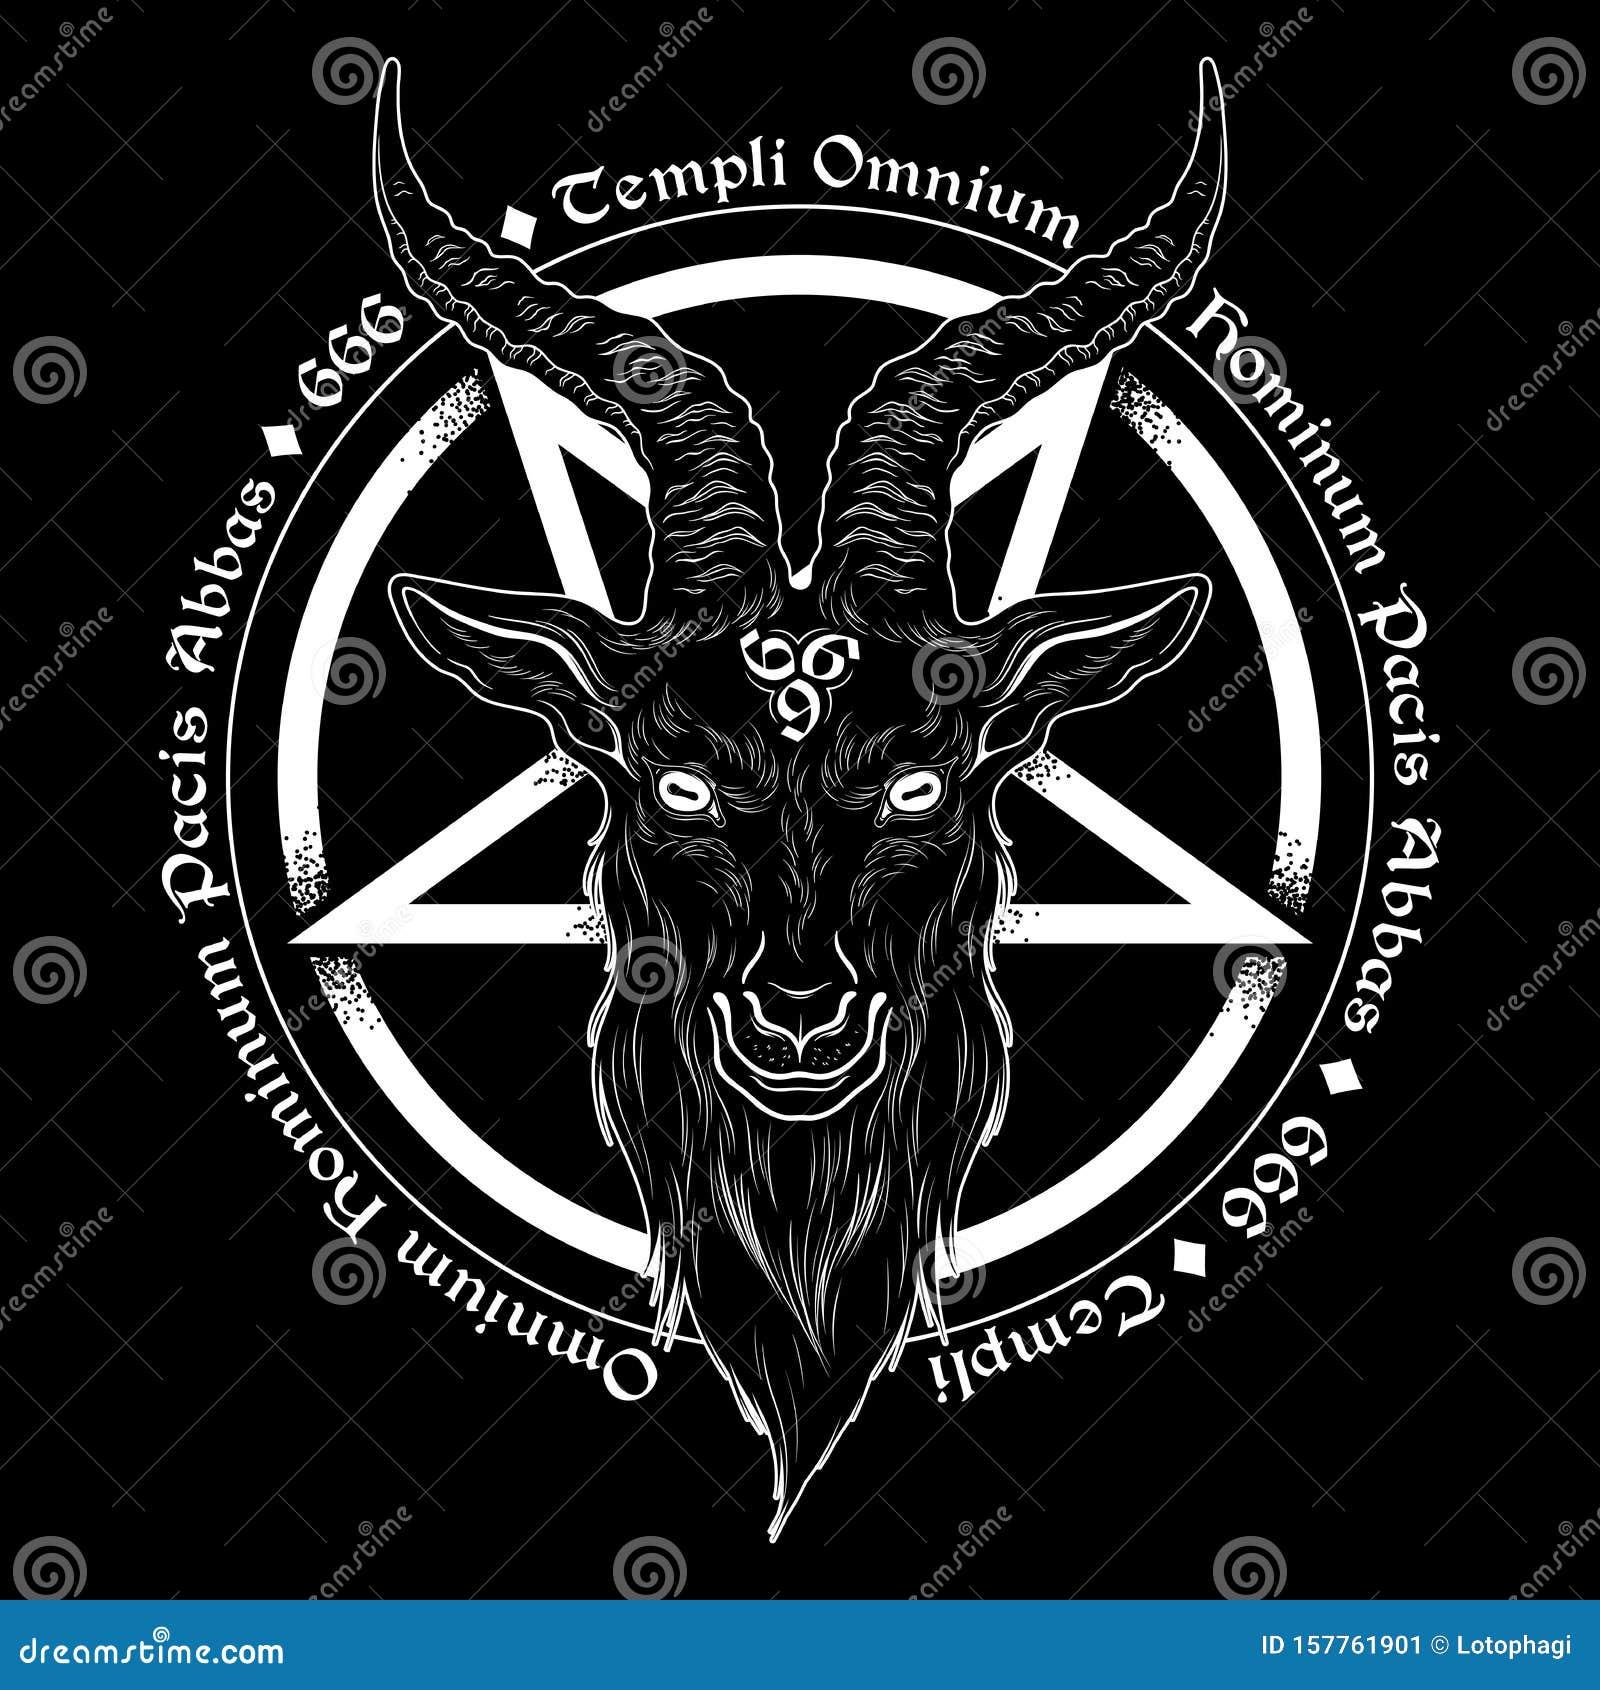 Baphomet Demon Goat Head Hand Drawn Print Or Blackwork Flash Tattoo Art Design Vector Illustration Latin Inscription Translation Stock Vector Illustration Of Head Black 157761901